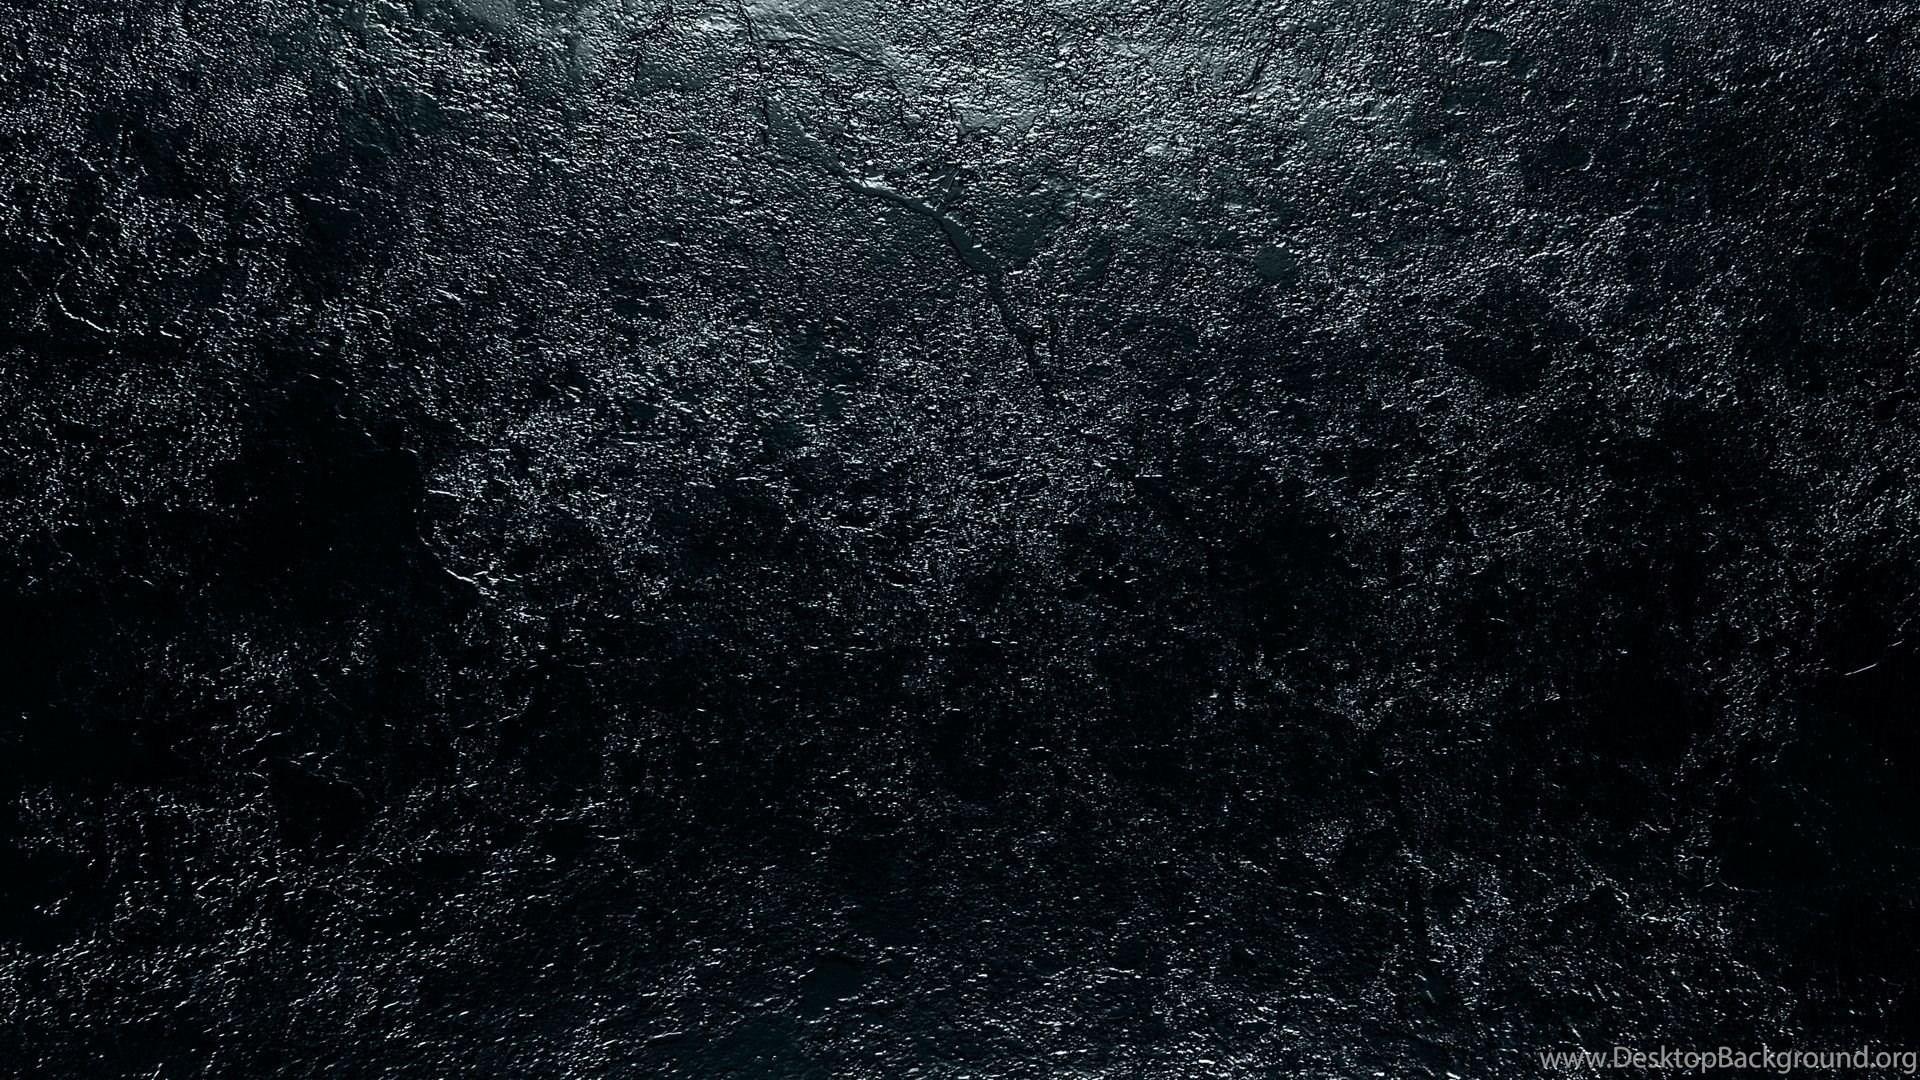 Dark Background 18325 18789 Hd Wallpapers Jpg 365 Radio Network